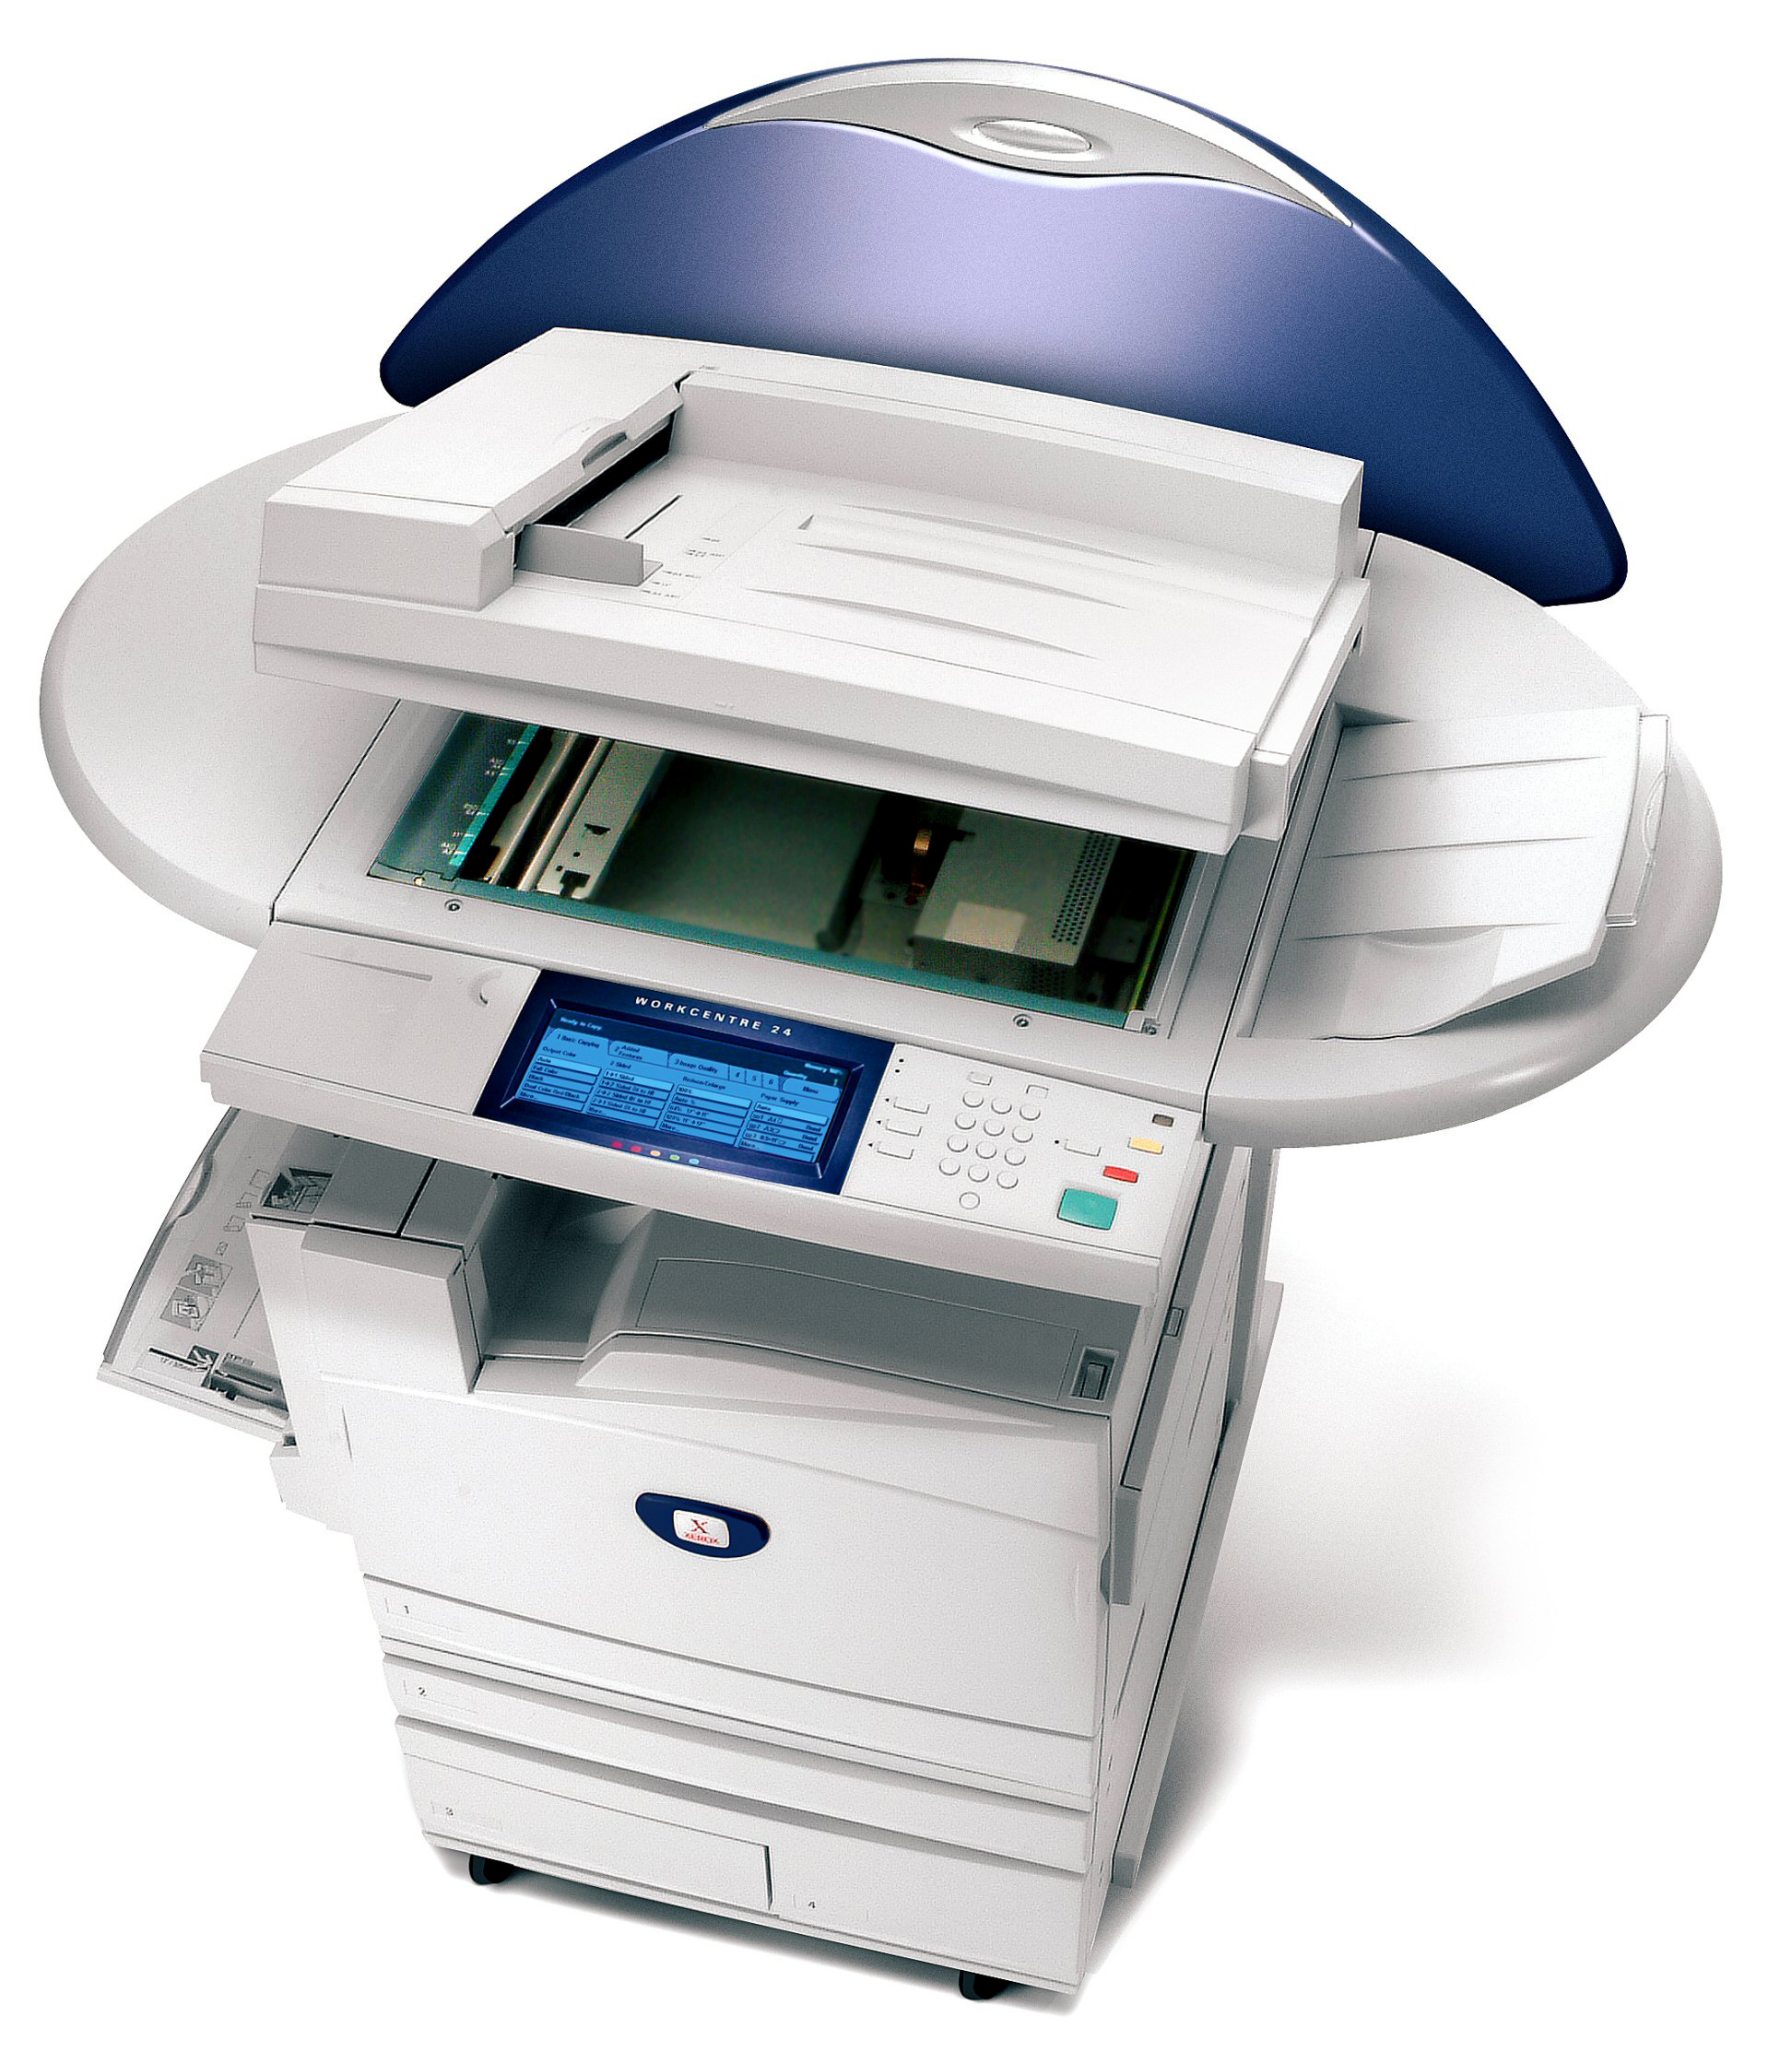 Xerox Workcentre 5020 Printer Driver For Windows 10